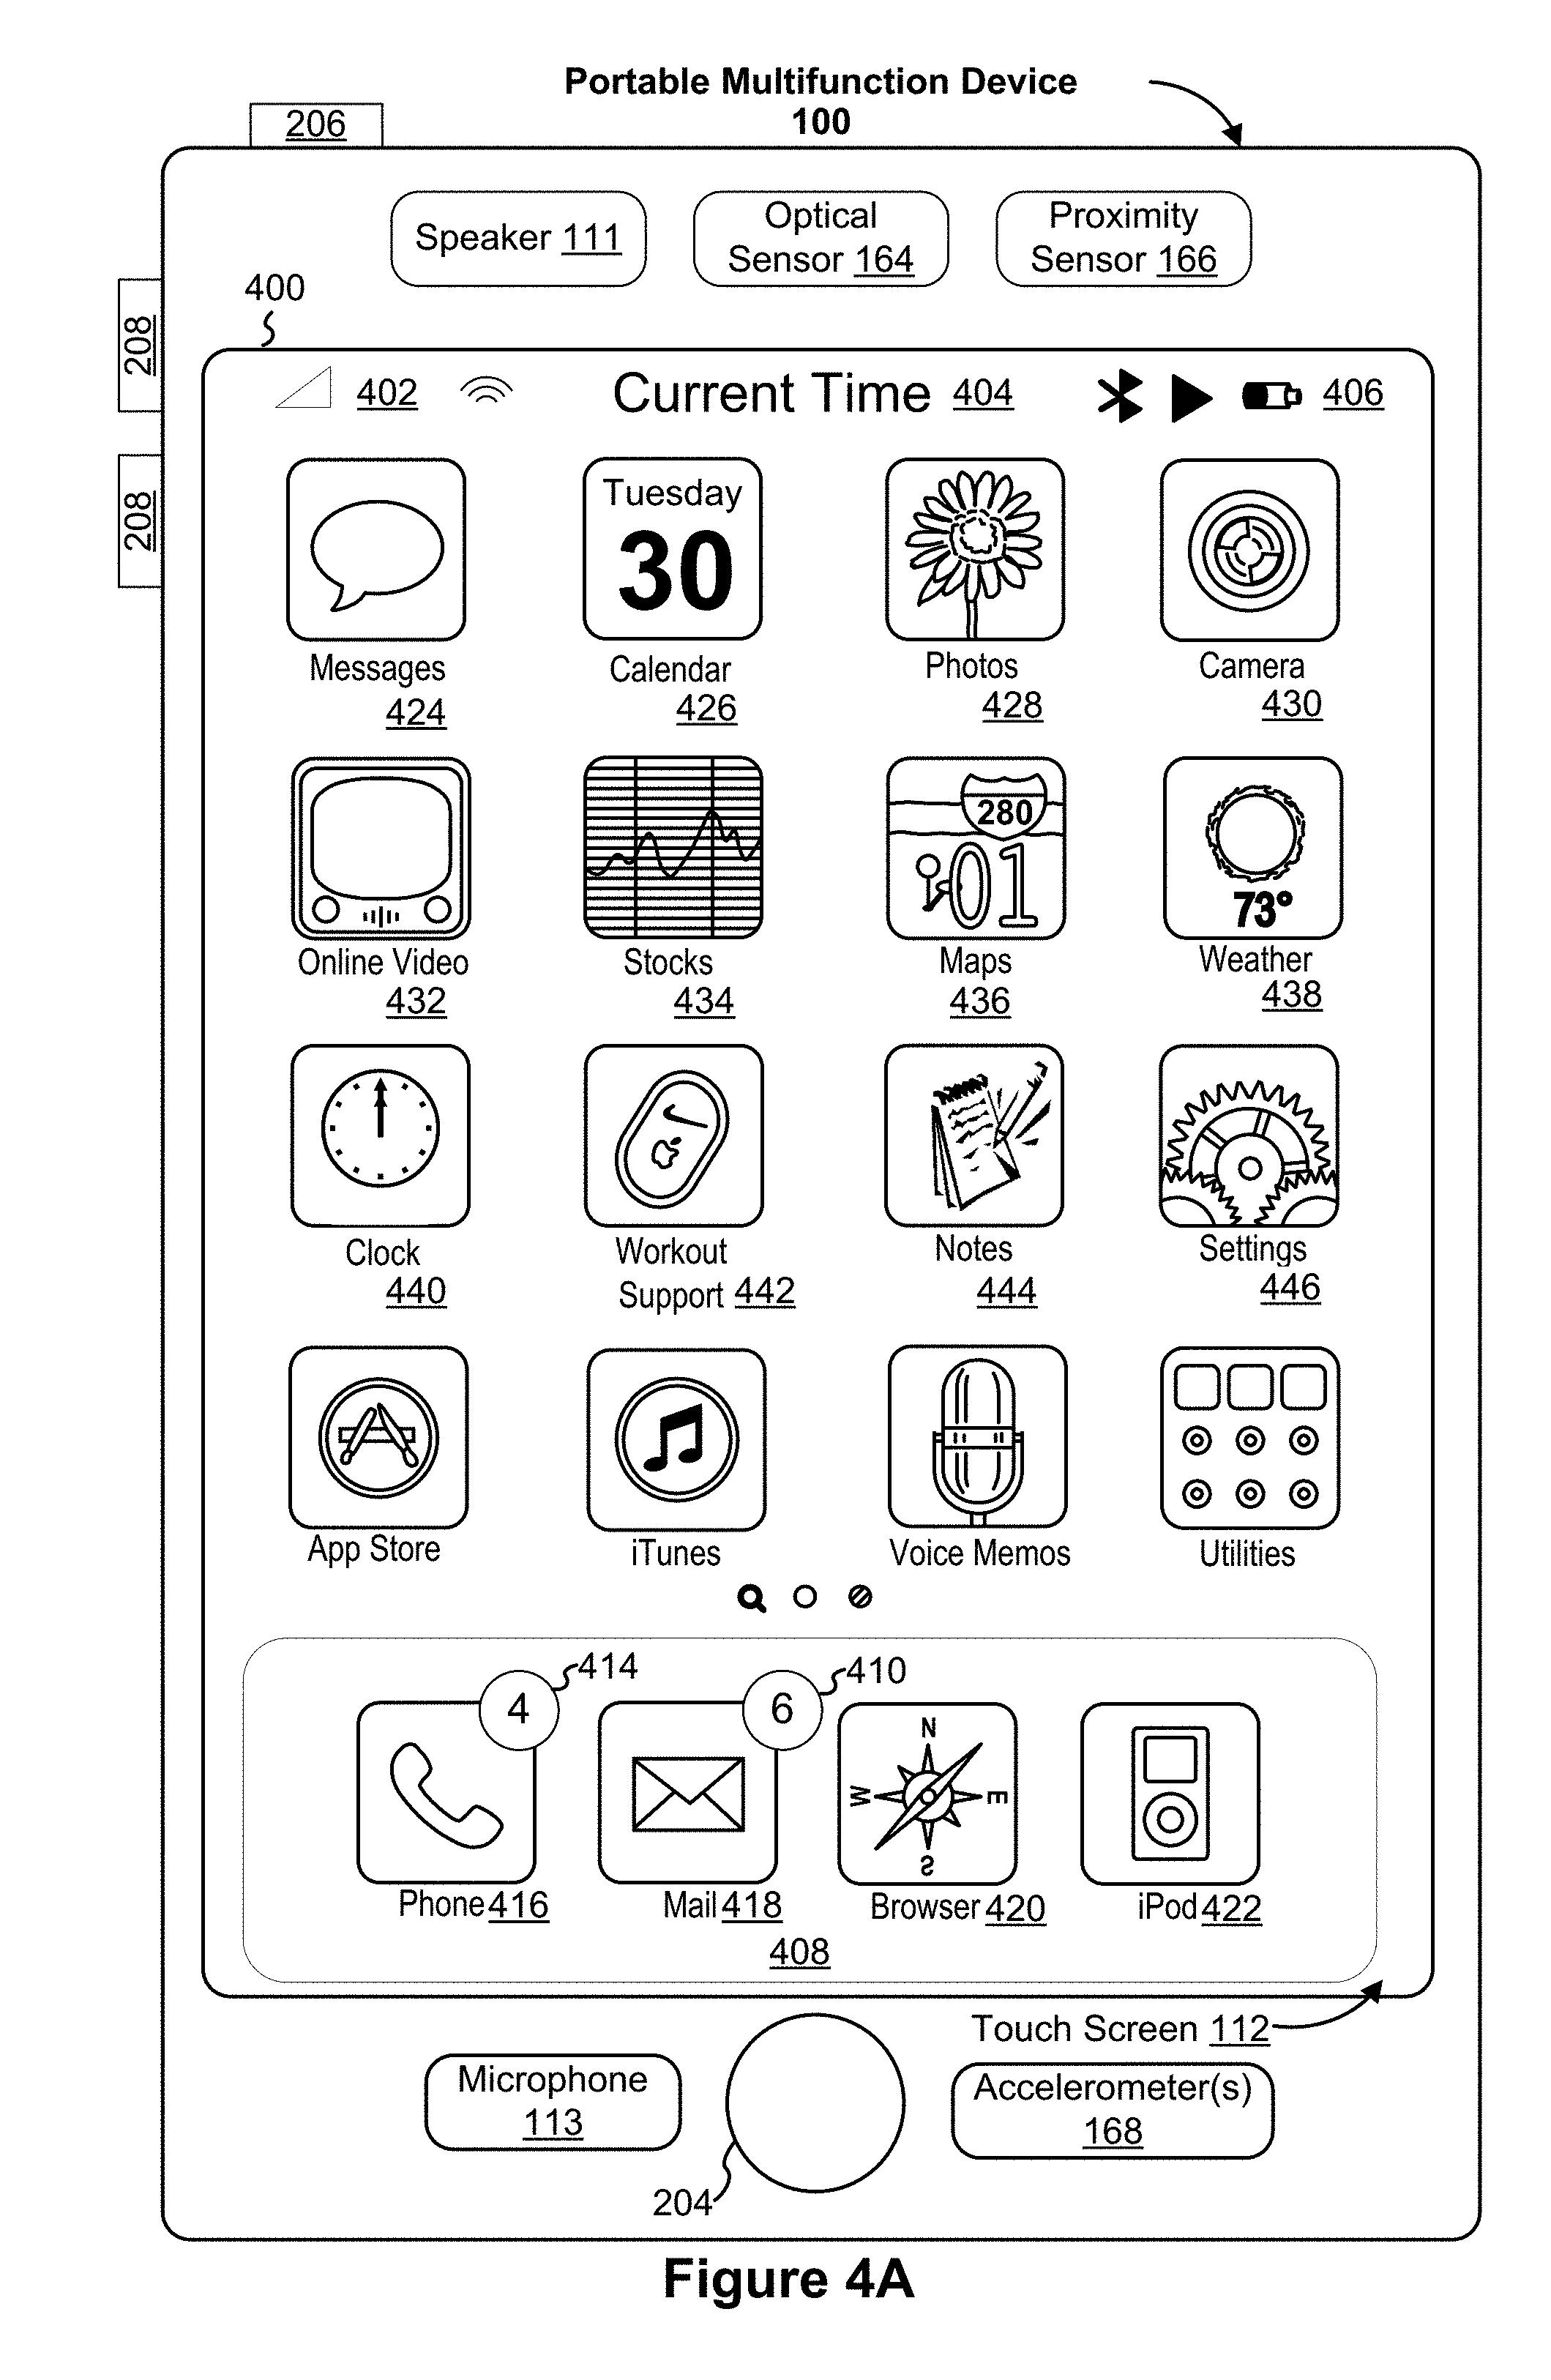 Patent US 9,990,107 B2